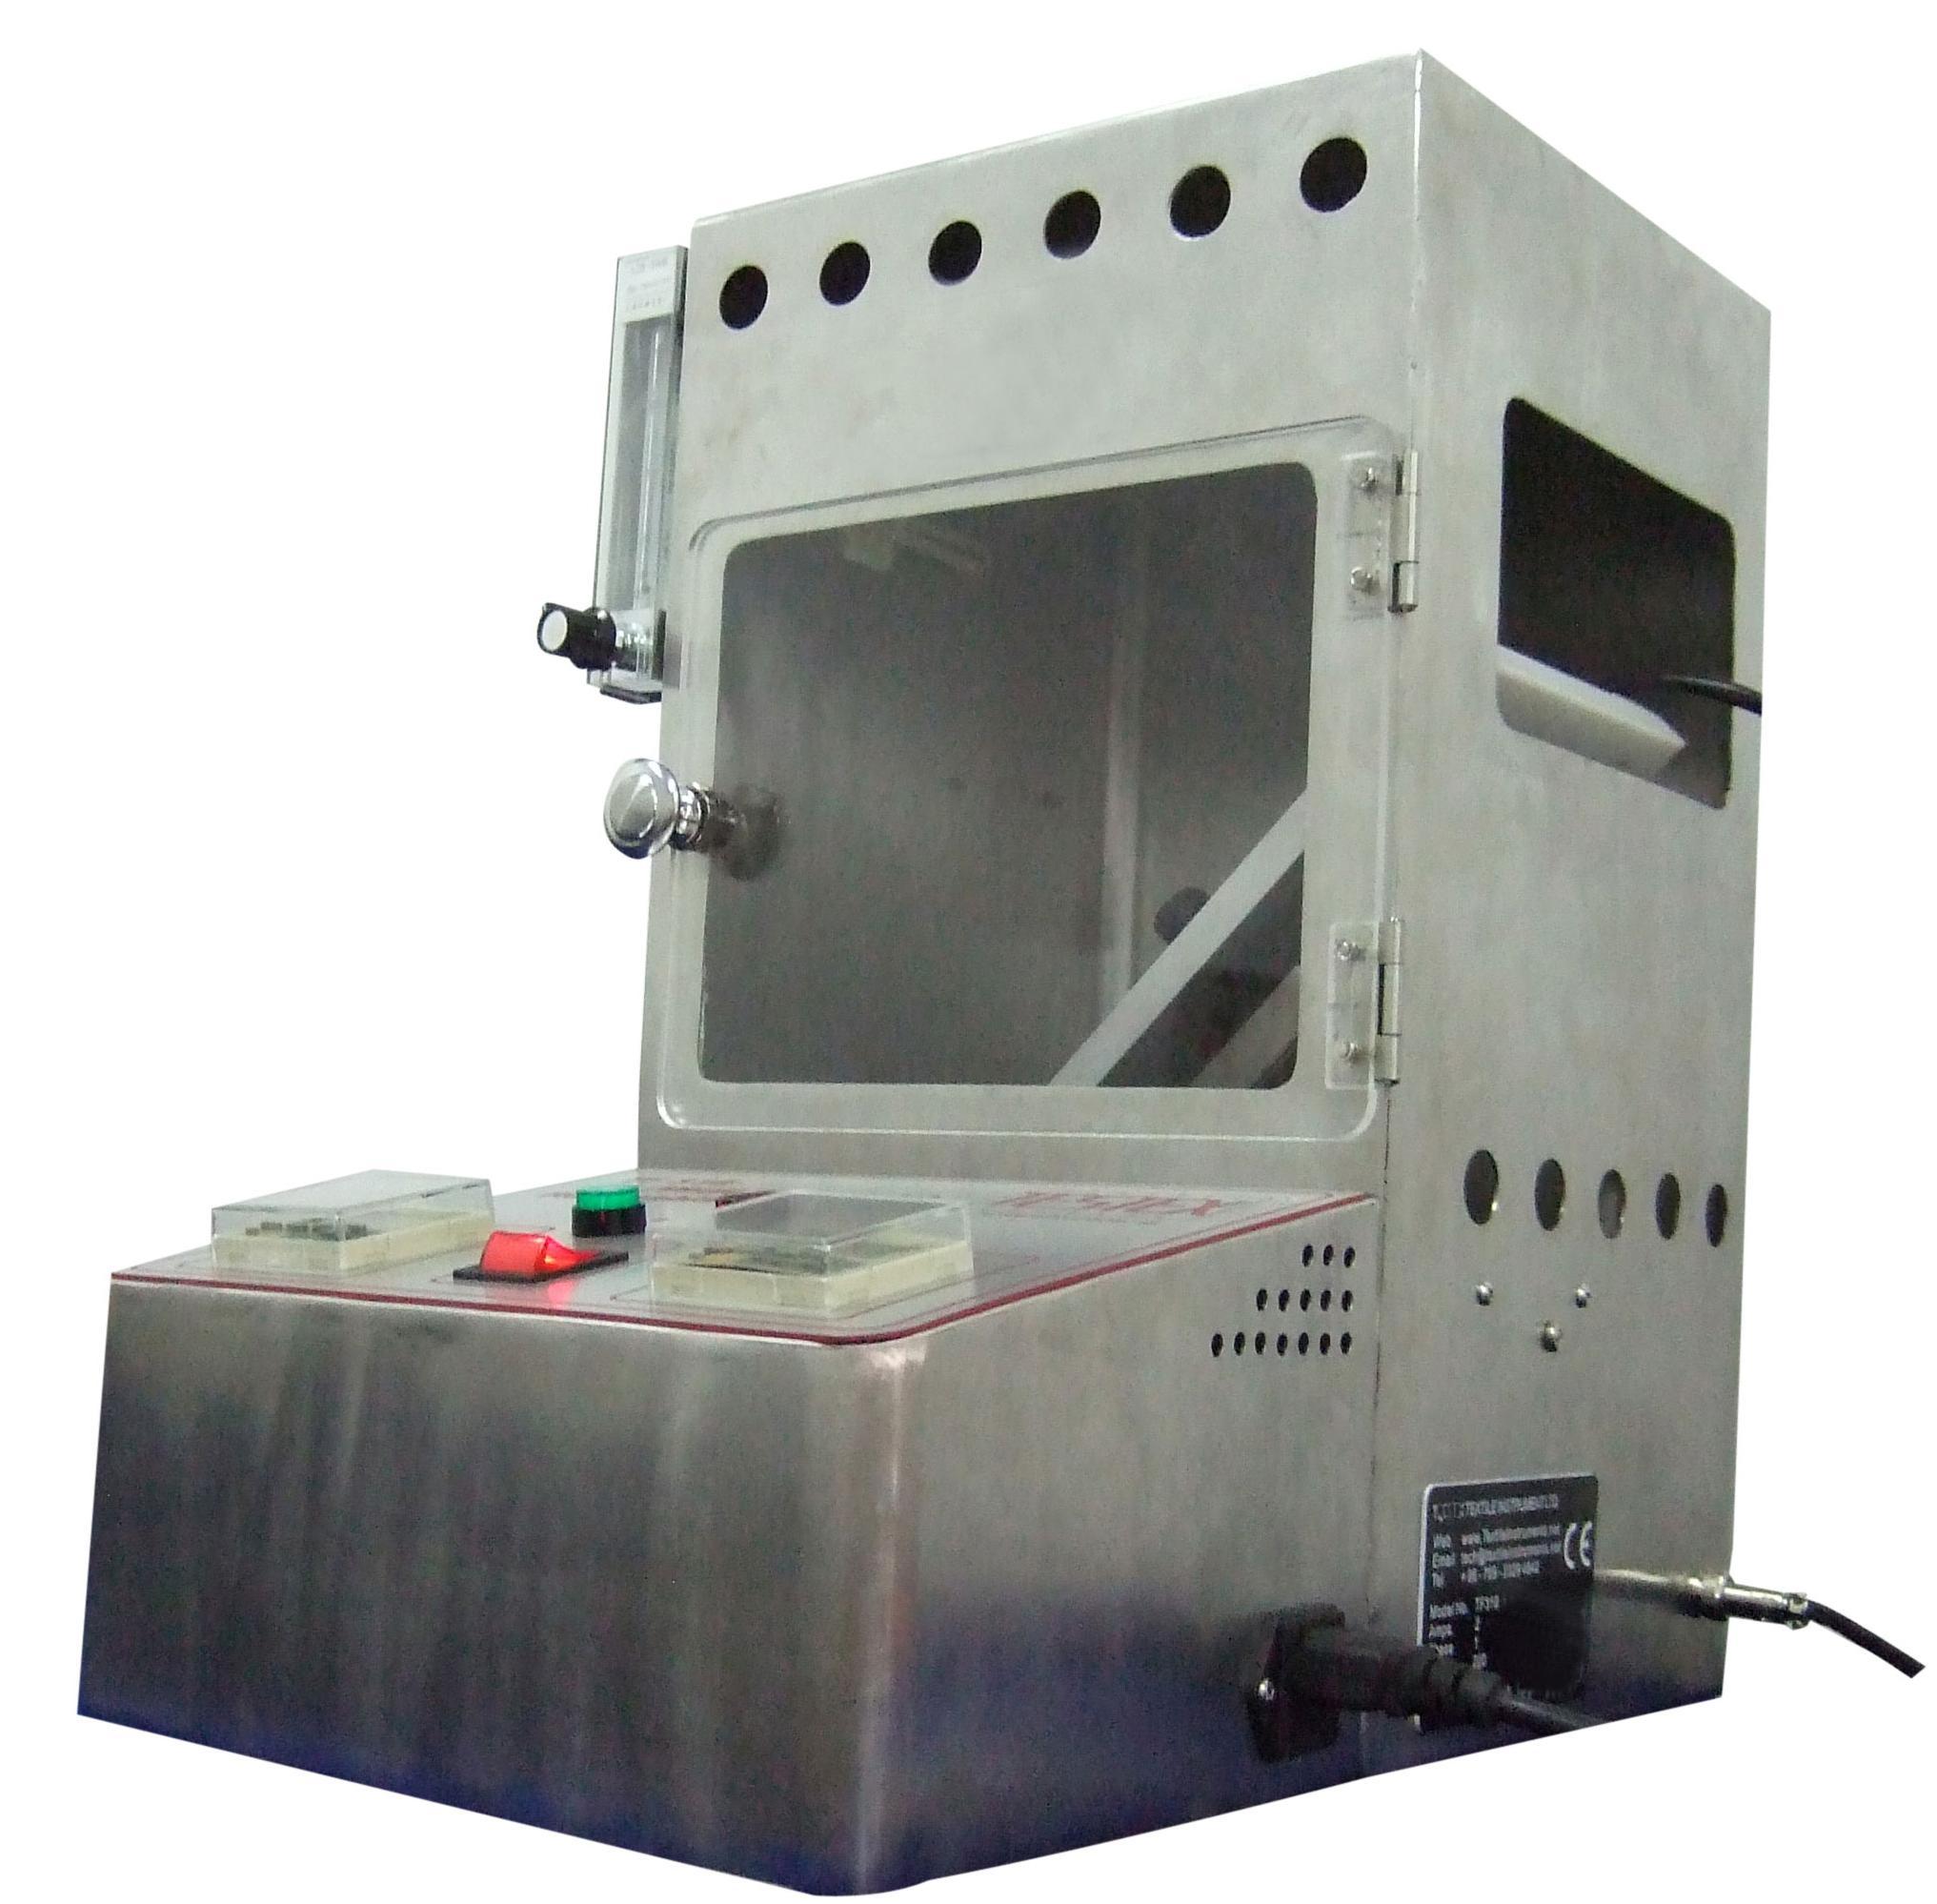 16 CFR 1611 Flammability Tester,SPI 45 Degree Flammability Tester.